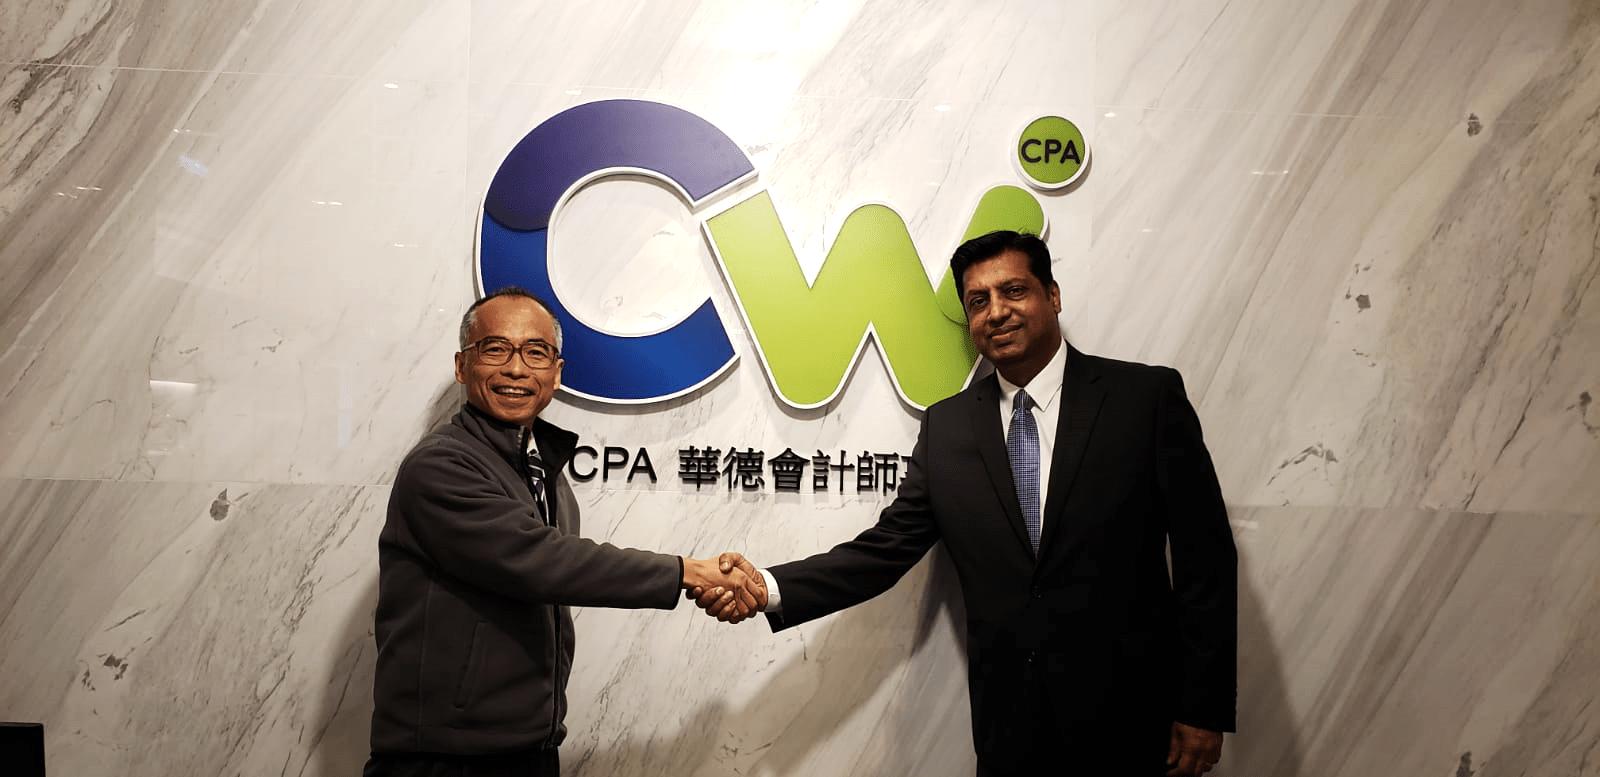 Mr. Thomas Wong with Dr. Ranjit Nair, CEO of Potluck Culture Solutions